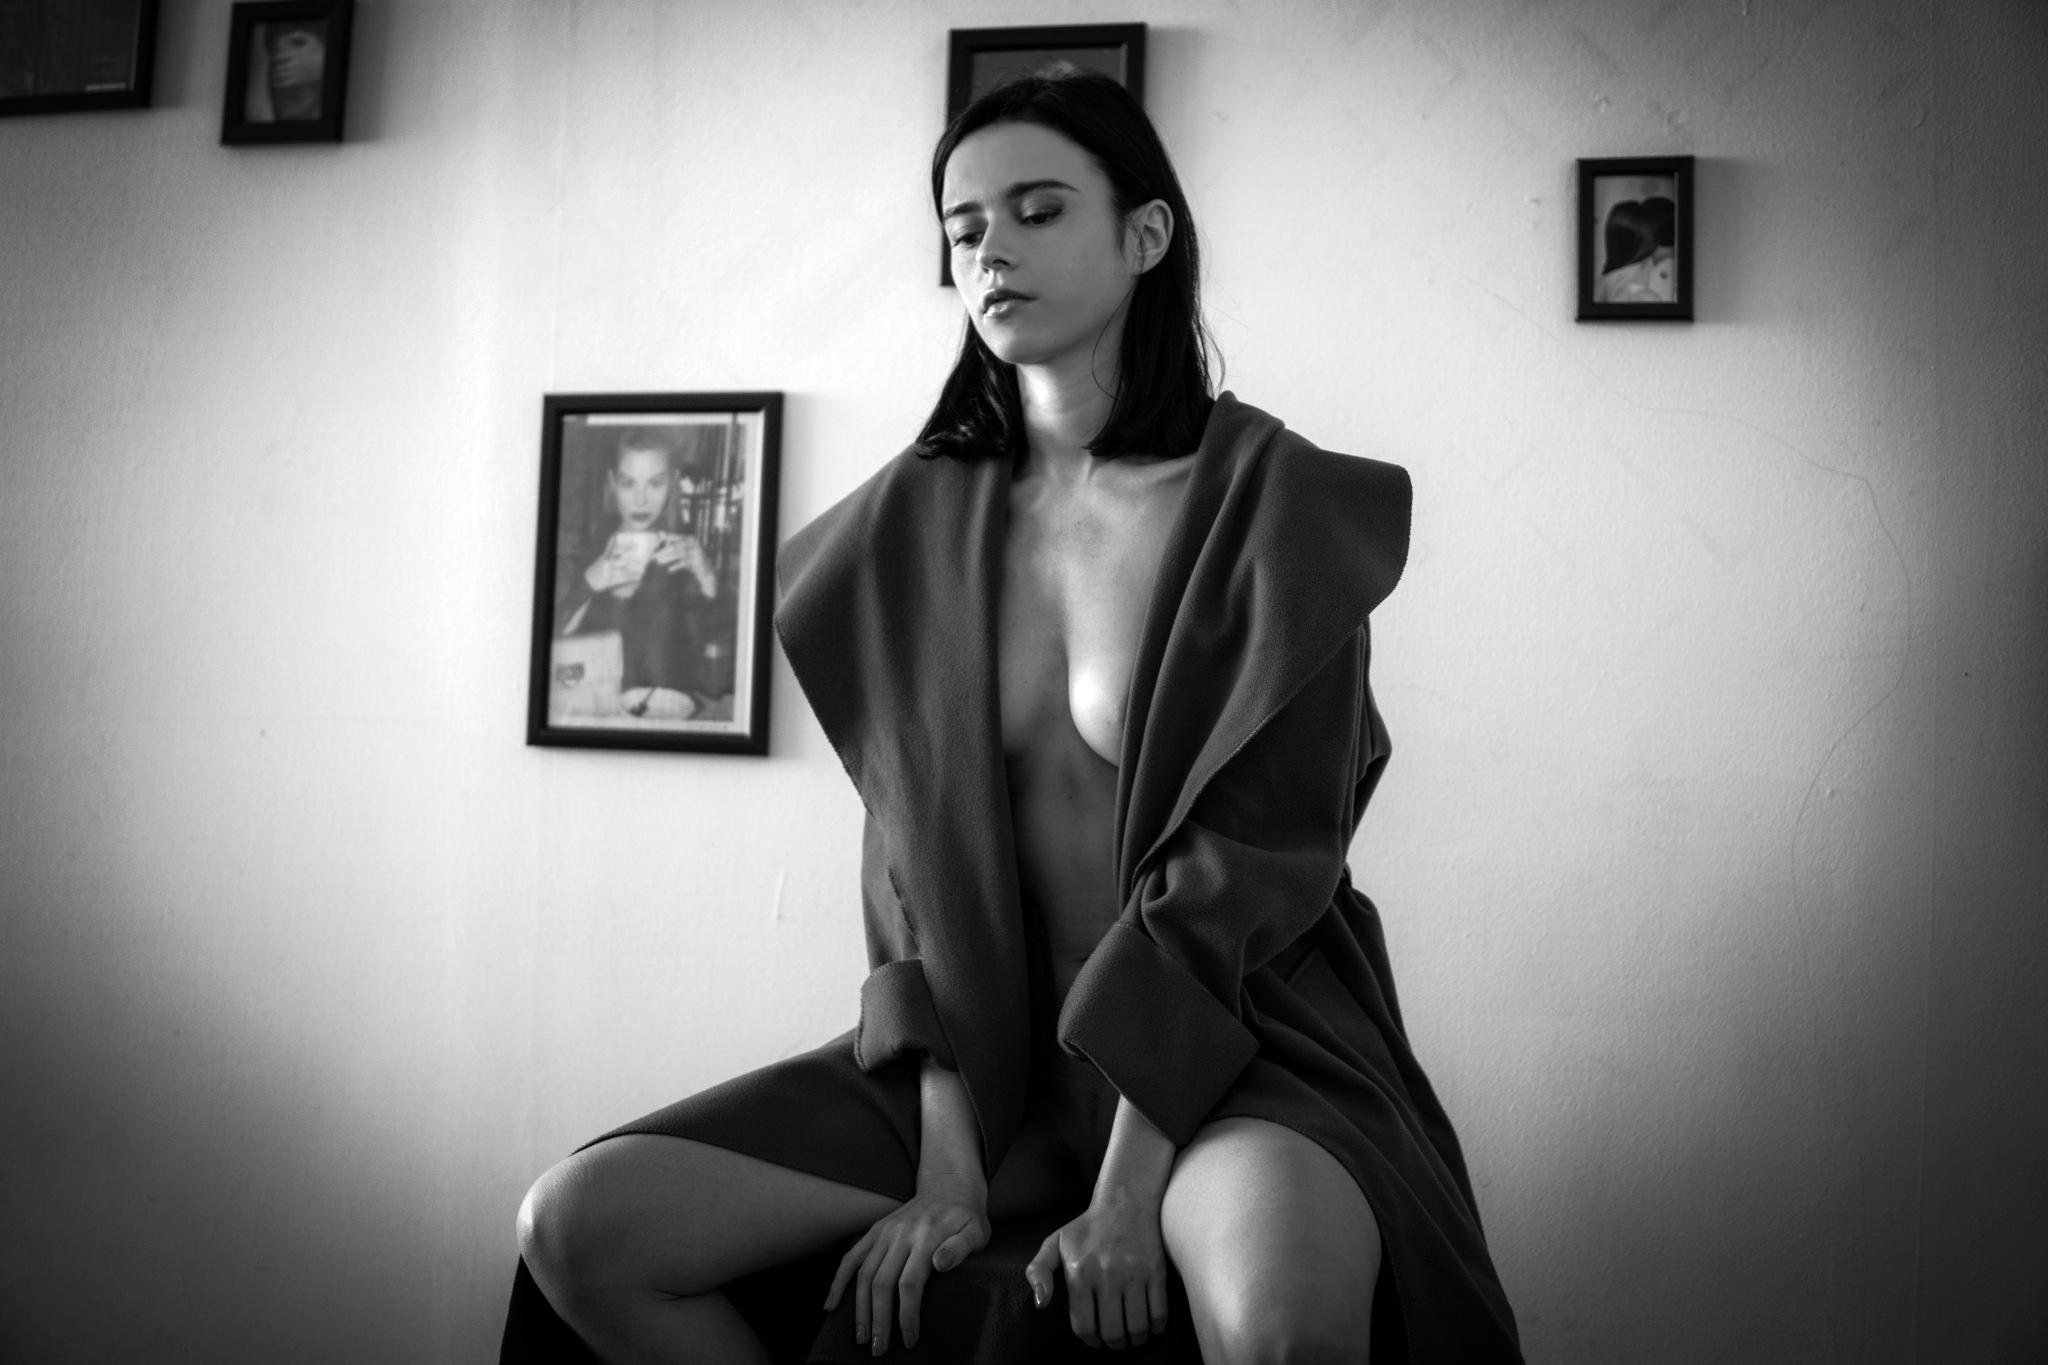 Polina09168 by Shuki Laufer